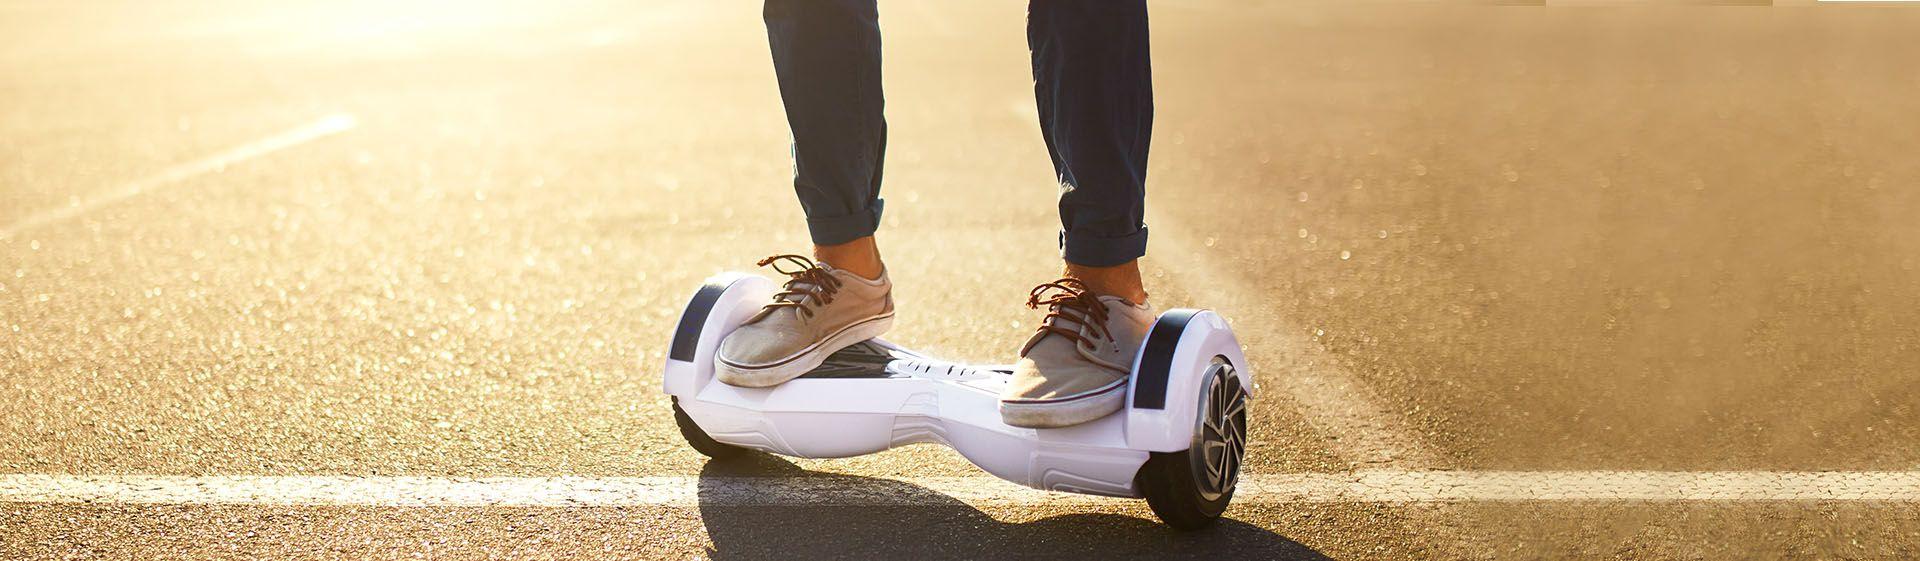 Melhor hoverboard de 2021: 5 modelos para comprar